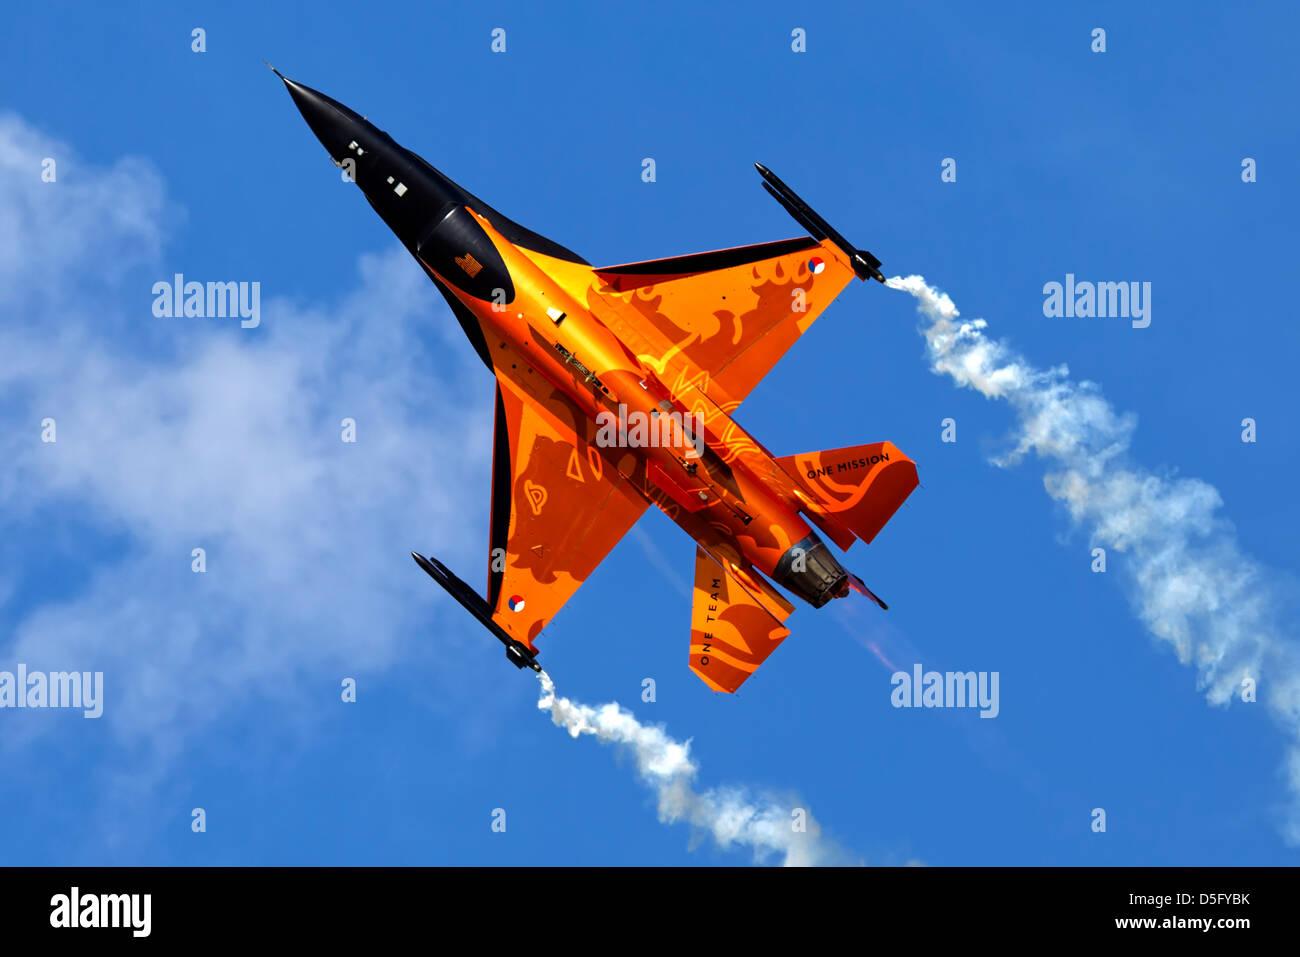 Royal Netherlands Air Force Escadron 323 General Dynamics F-16AM Fighting Falcon 'Orange Lion' à RIAT, RAF Fairford, UK, 2010. Banque D'Images